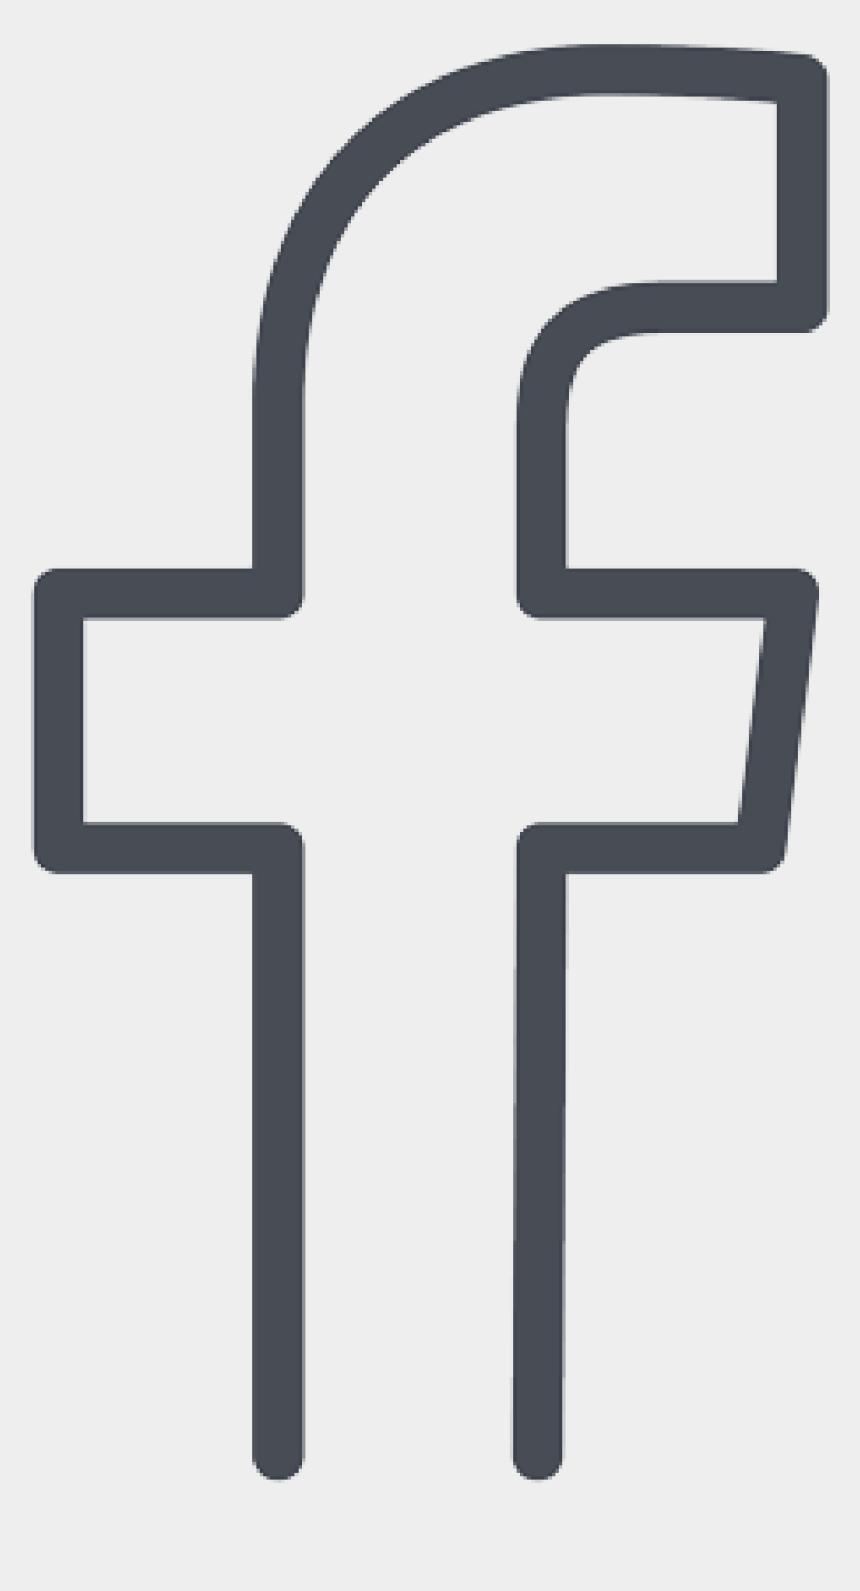 christian cross designs clip art, Cartoons - Facebook Emoji Png - Icon Facebook Emojis